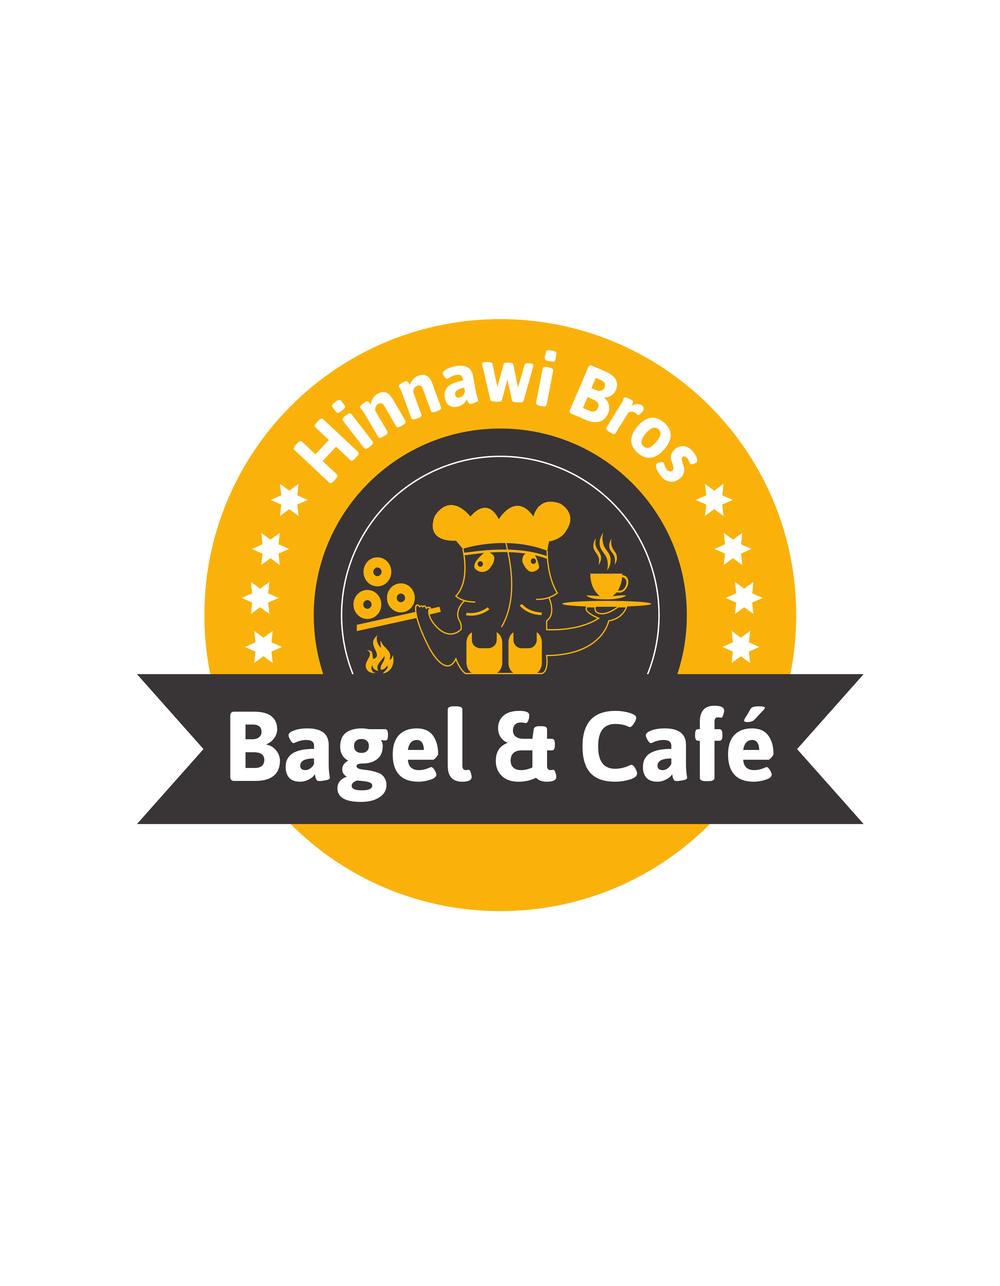 Hinnawi Bros Logo_final.ai_000001.png